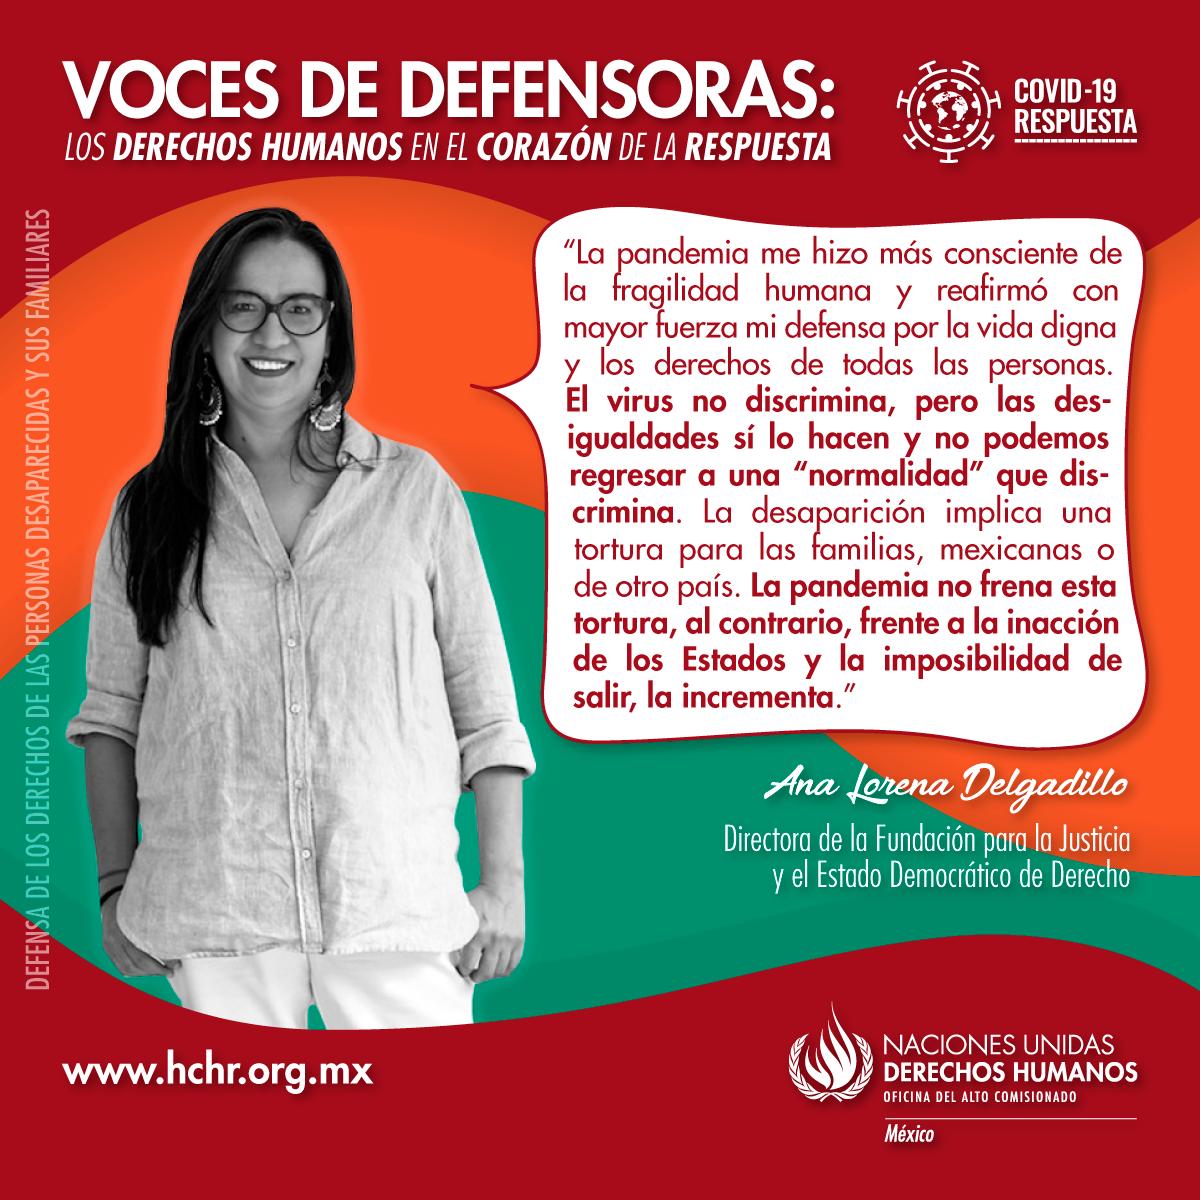 VocesDefensoras_COVID_analorena